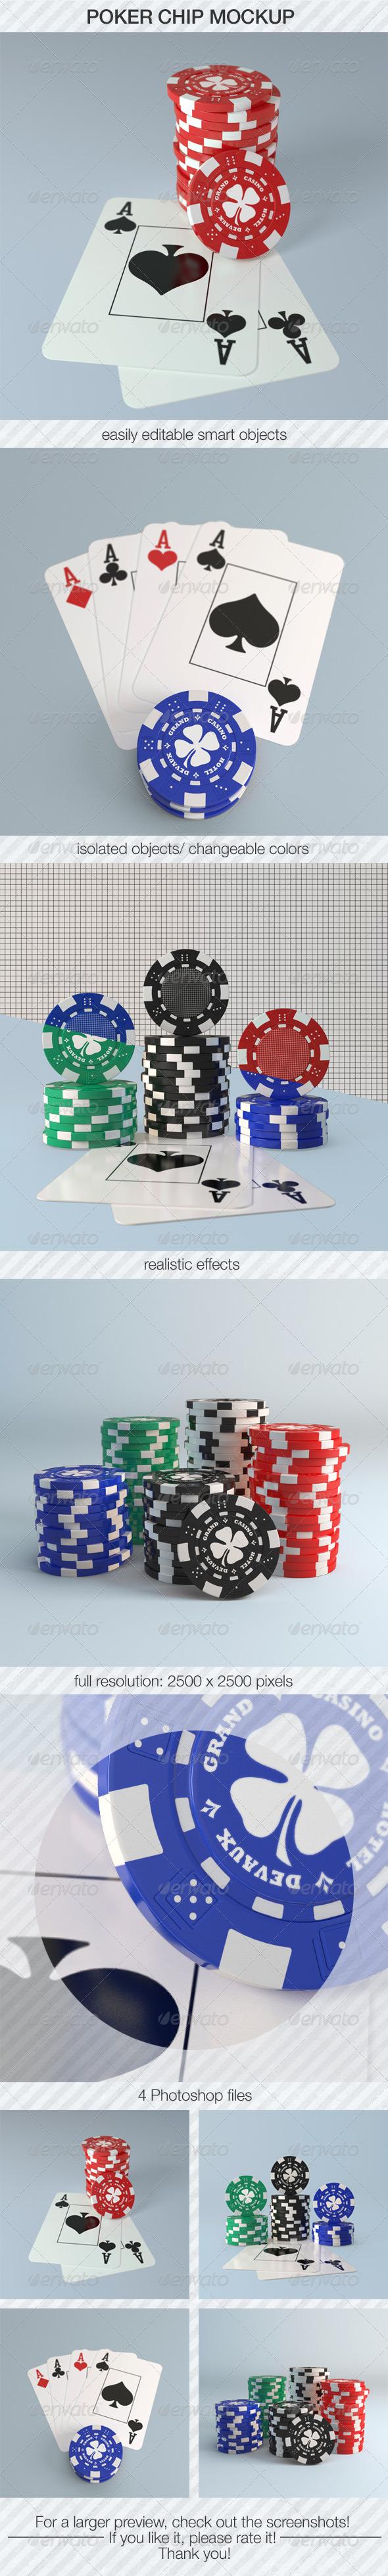 GraphicRiver Poker Chip Mockup 5480460